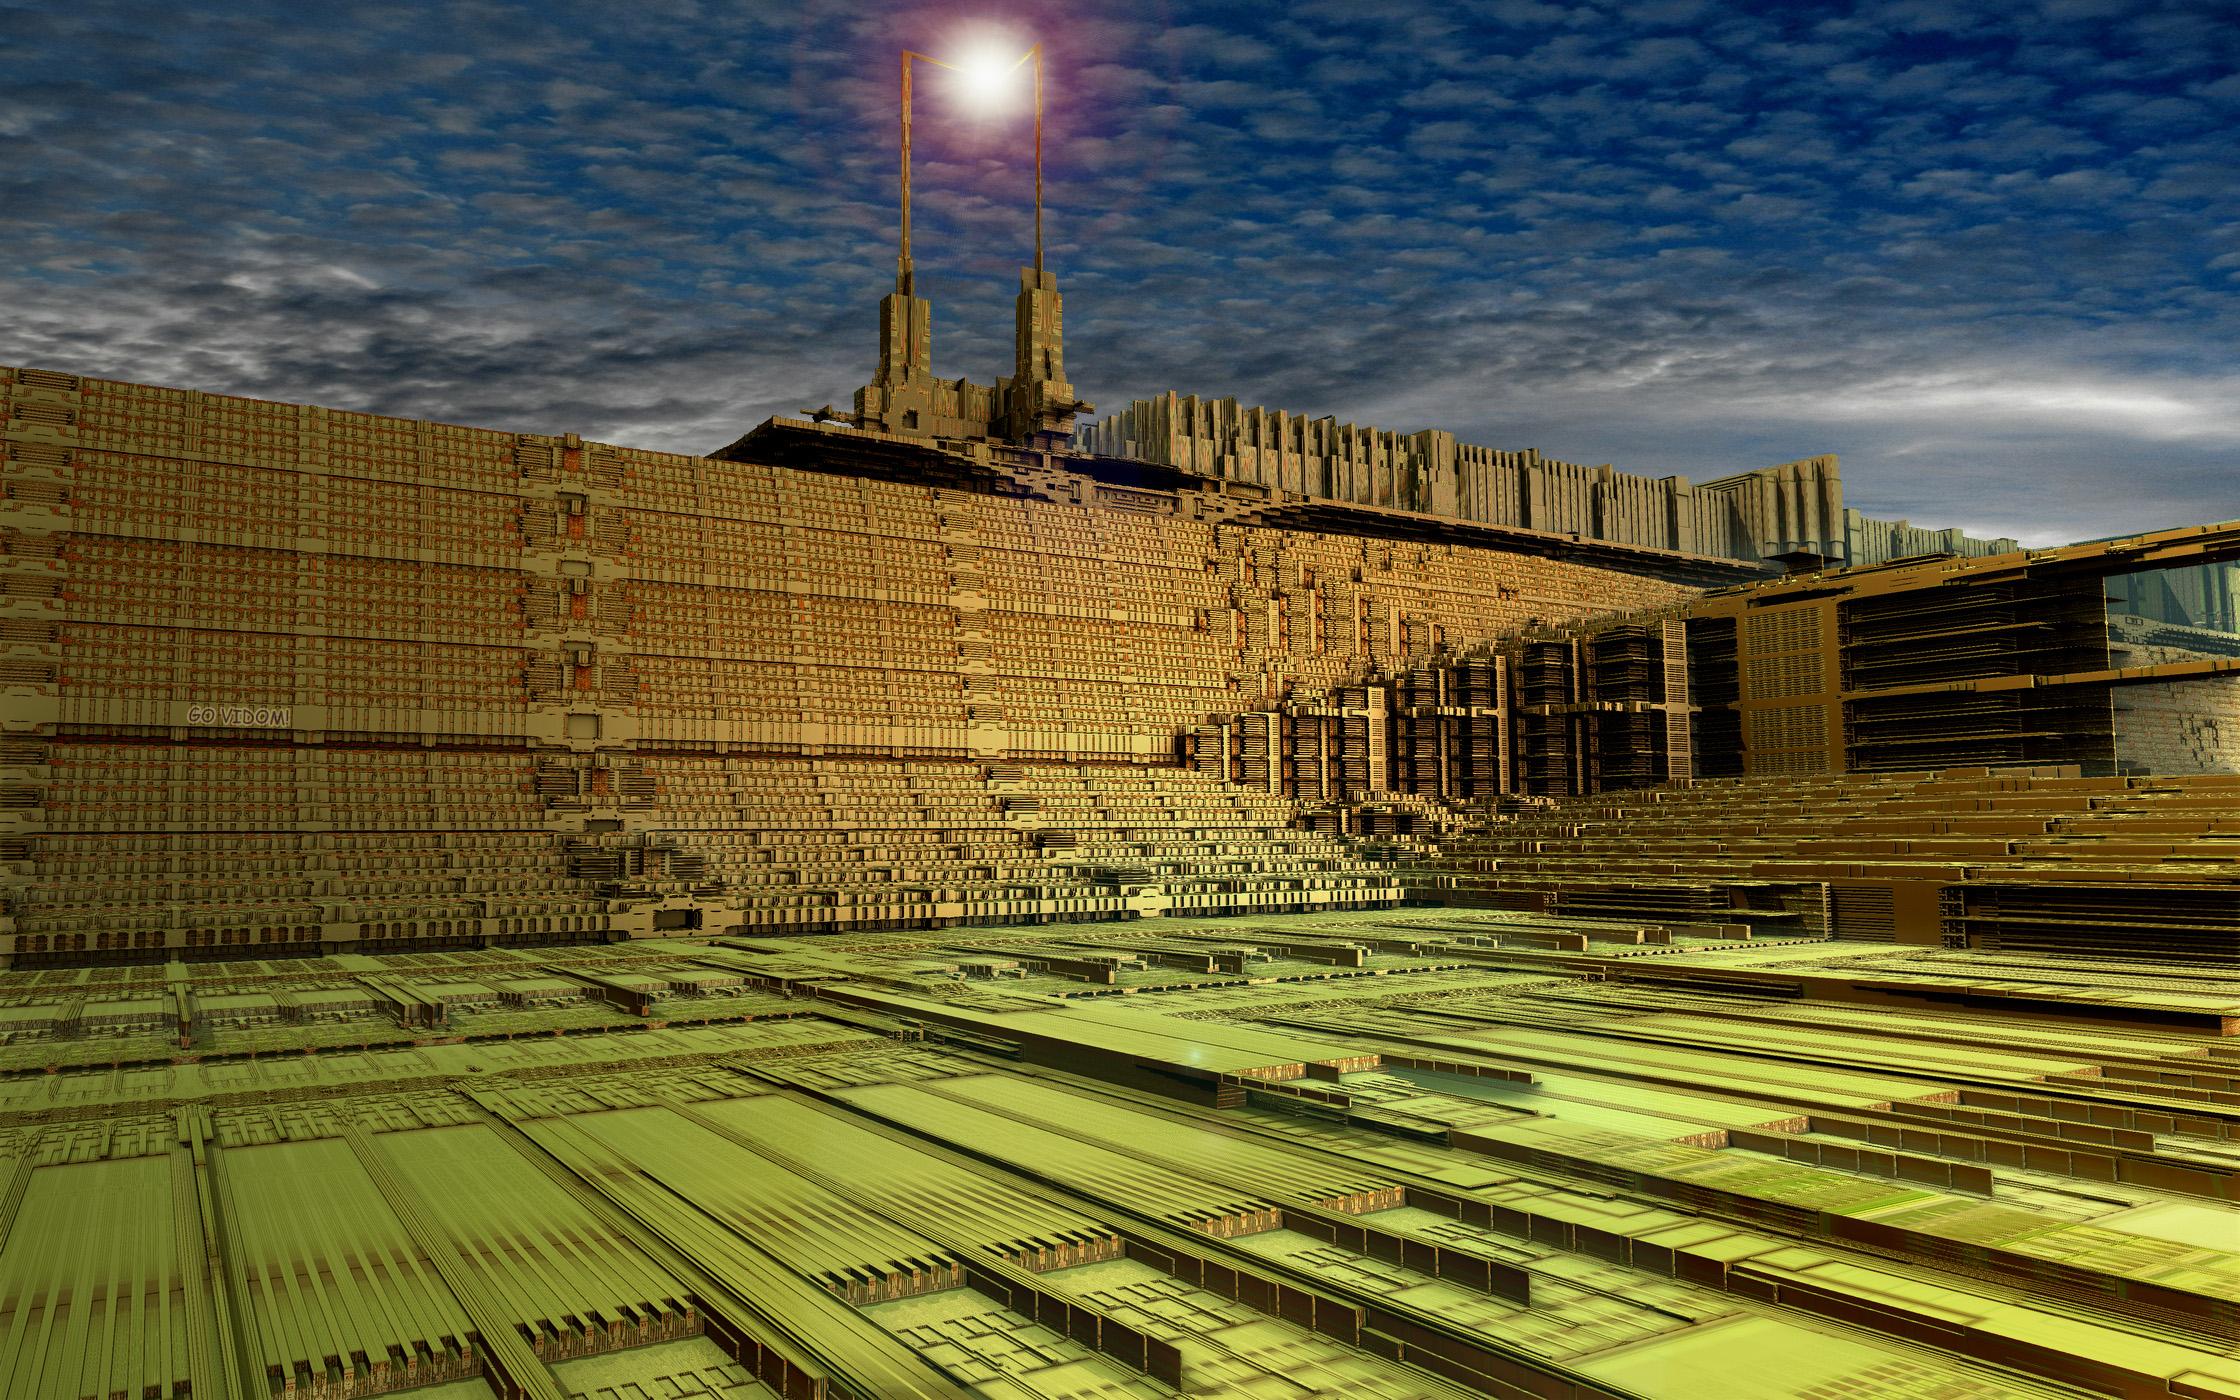 Diapason Stadium by Vidom